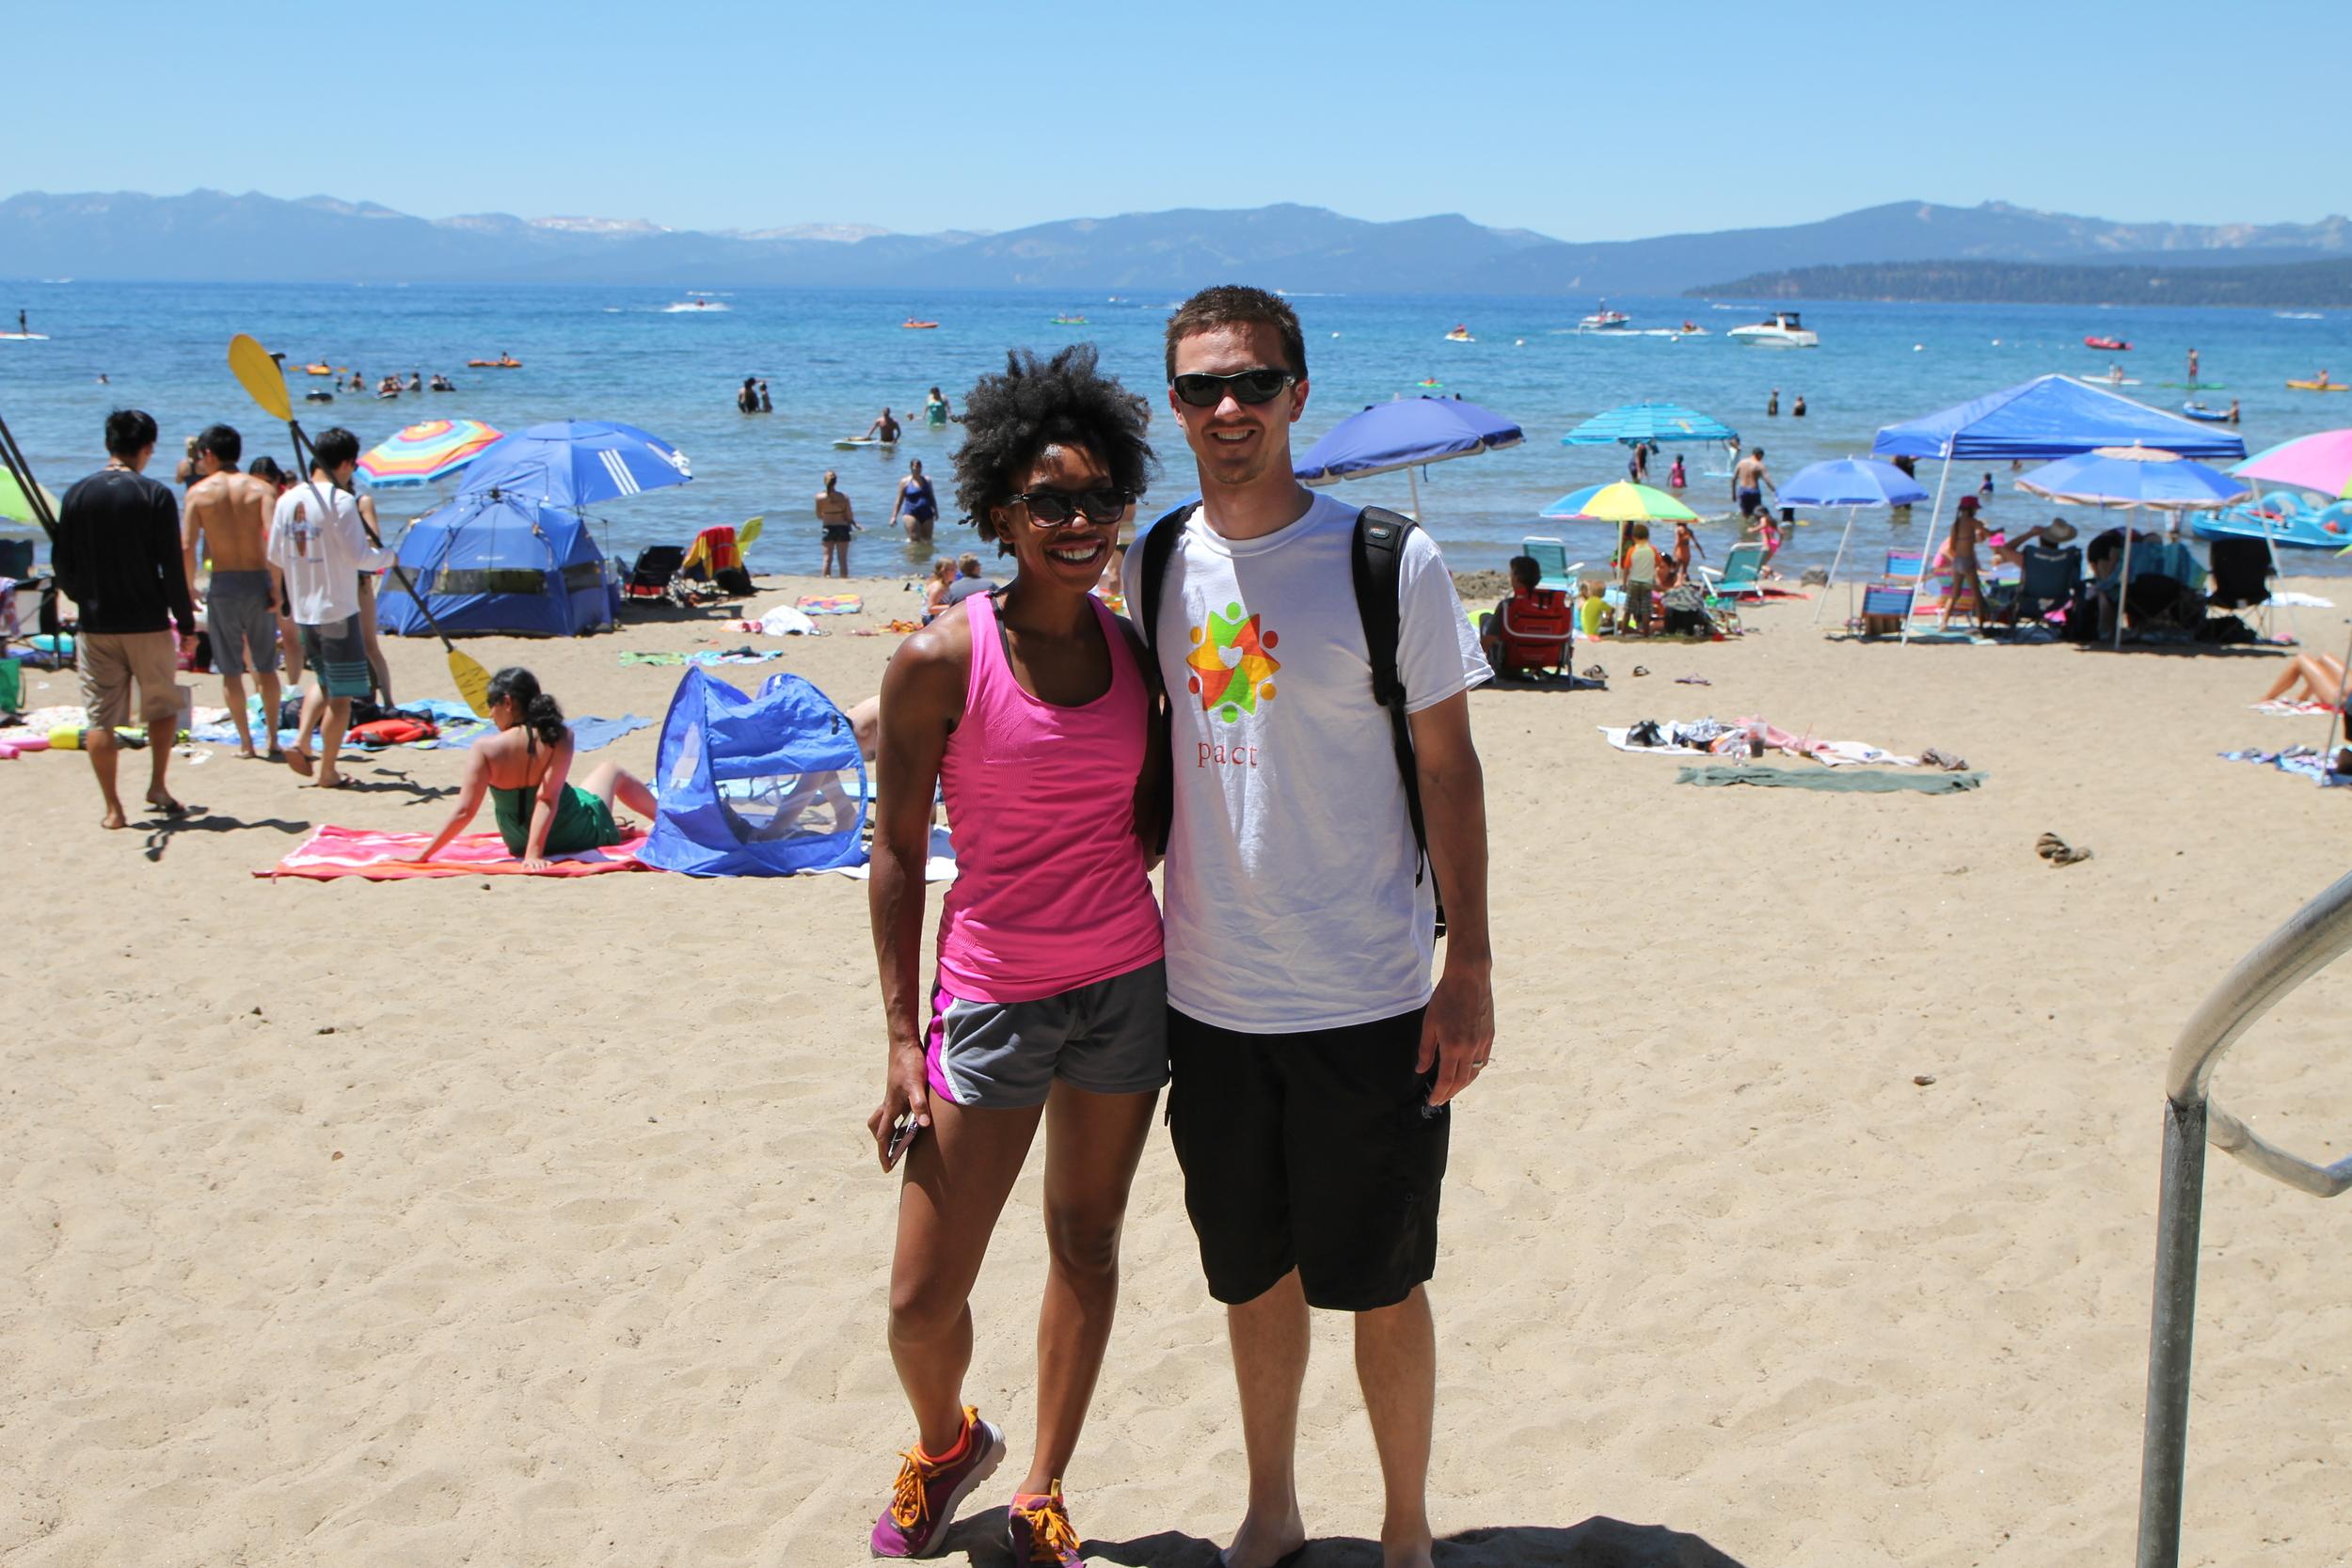 Beach on Lake Tahoe